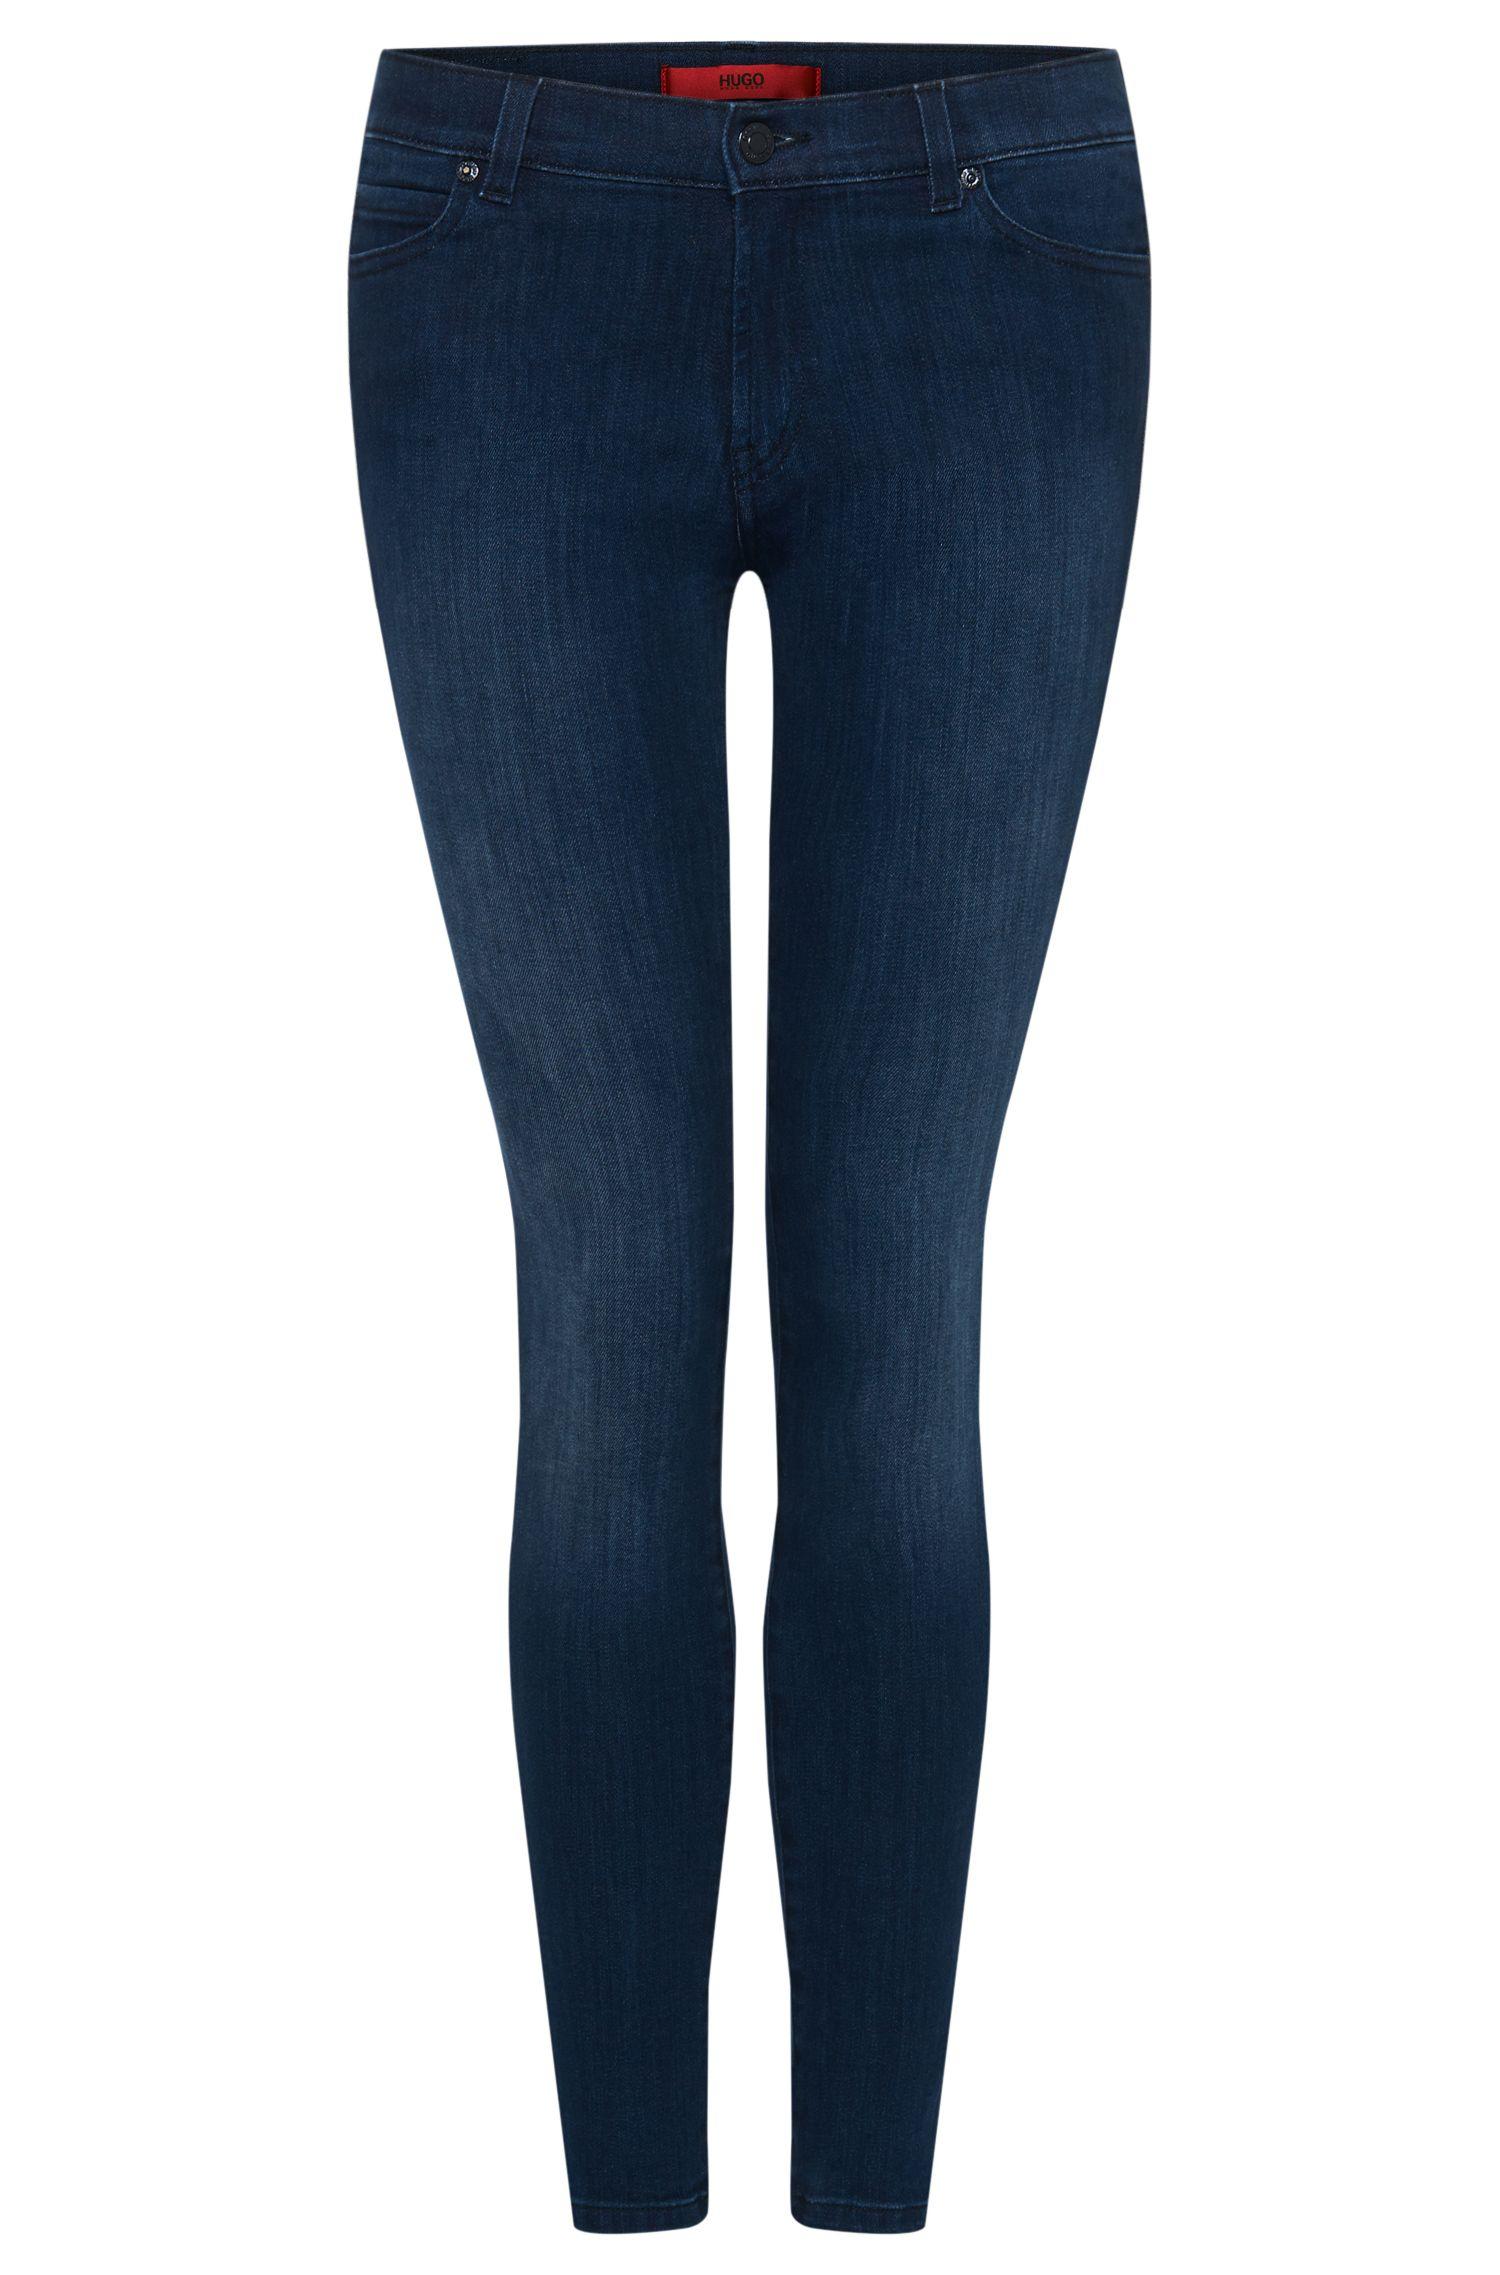 'Georgina' | Stretch Cotton Blend Mid Rise Jeans